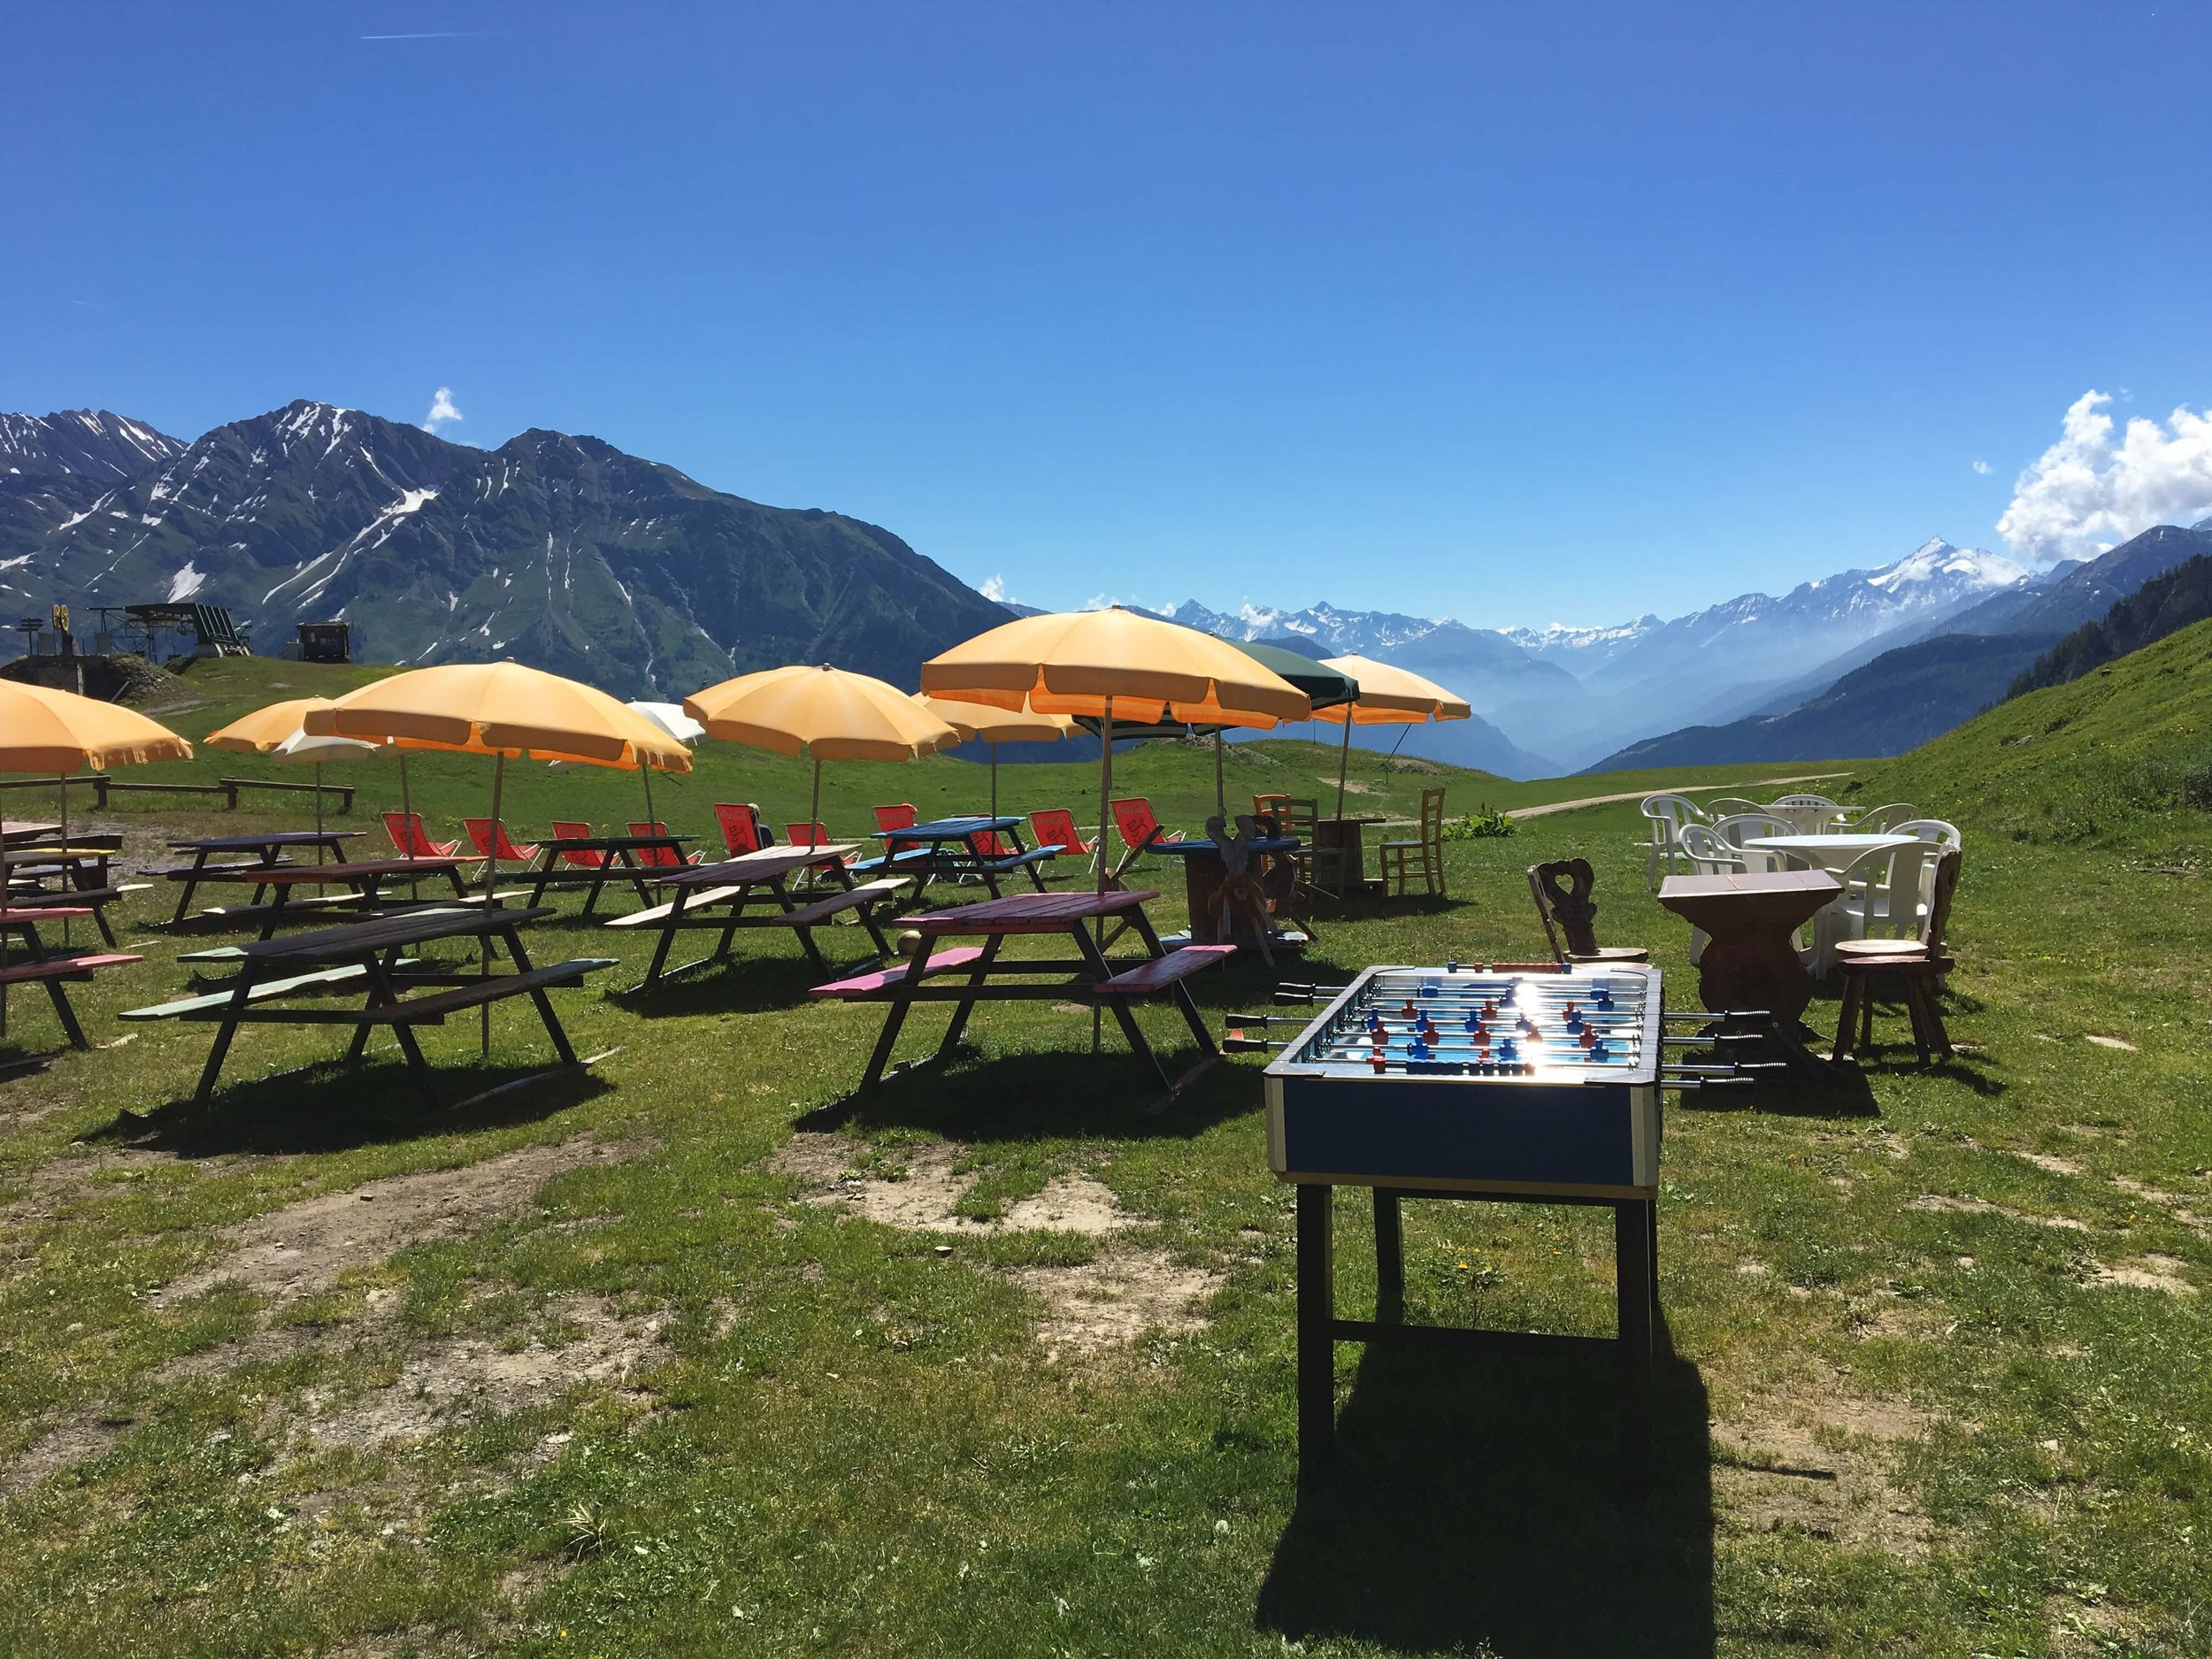 Refugio Maison Vieille:  Alpine Foosball anyone?